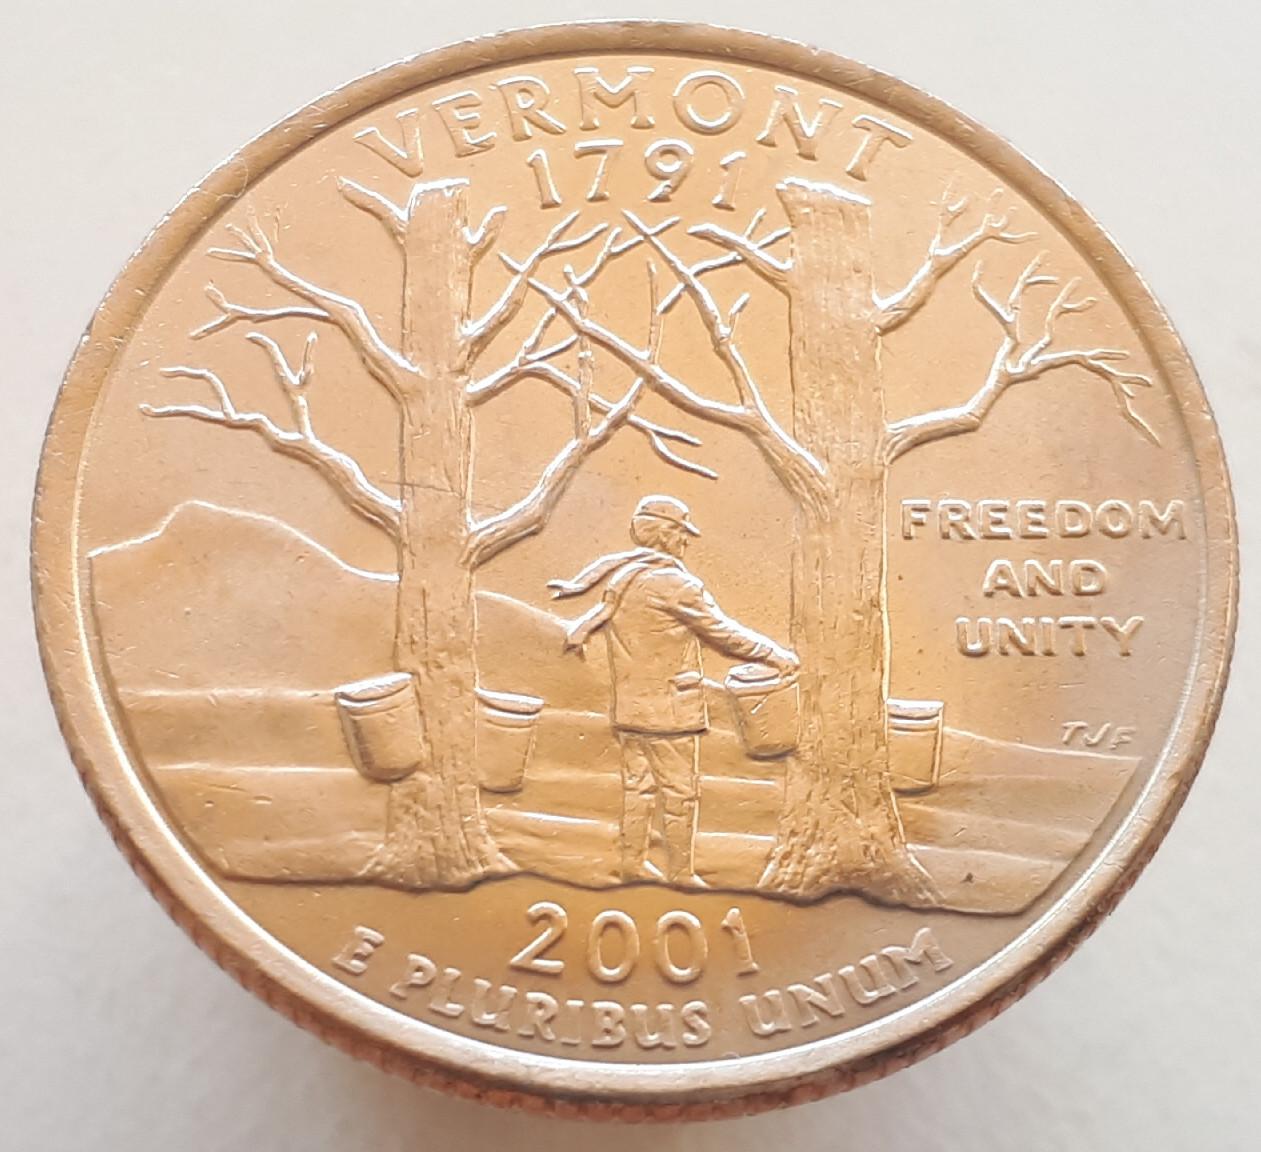 США 25 центов 2001 Вермонт D